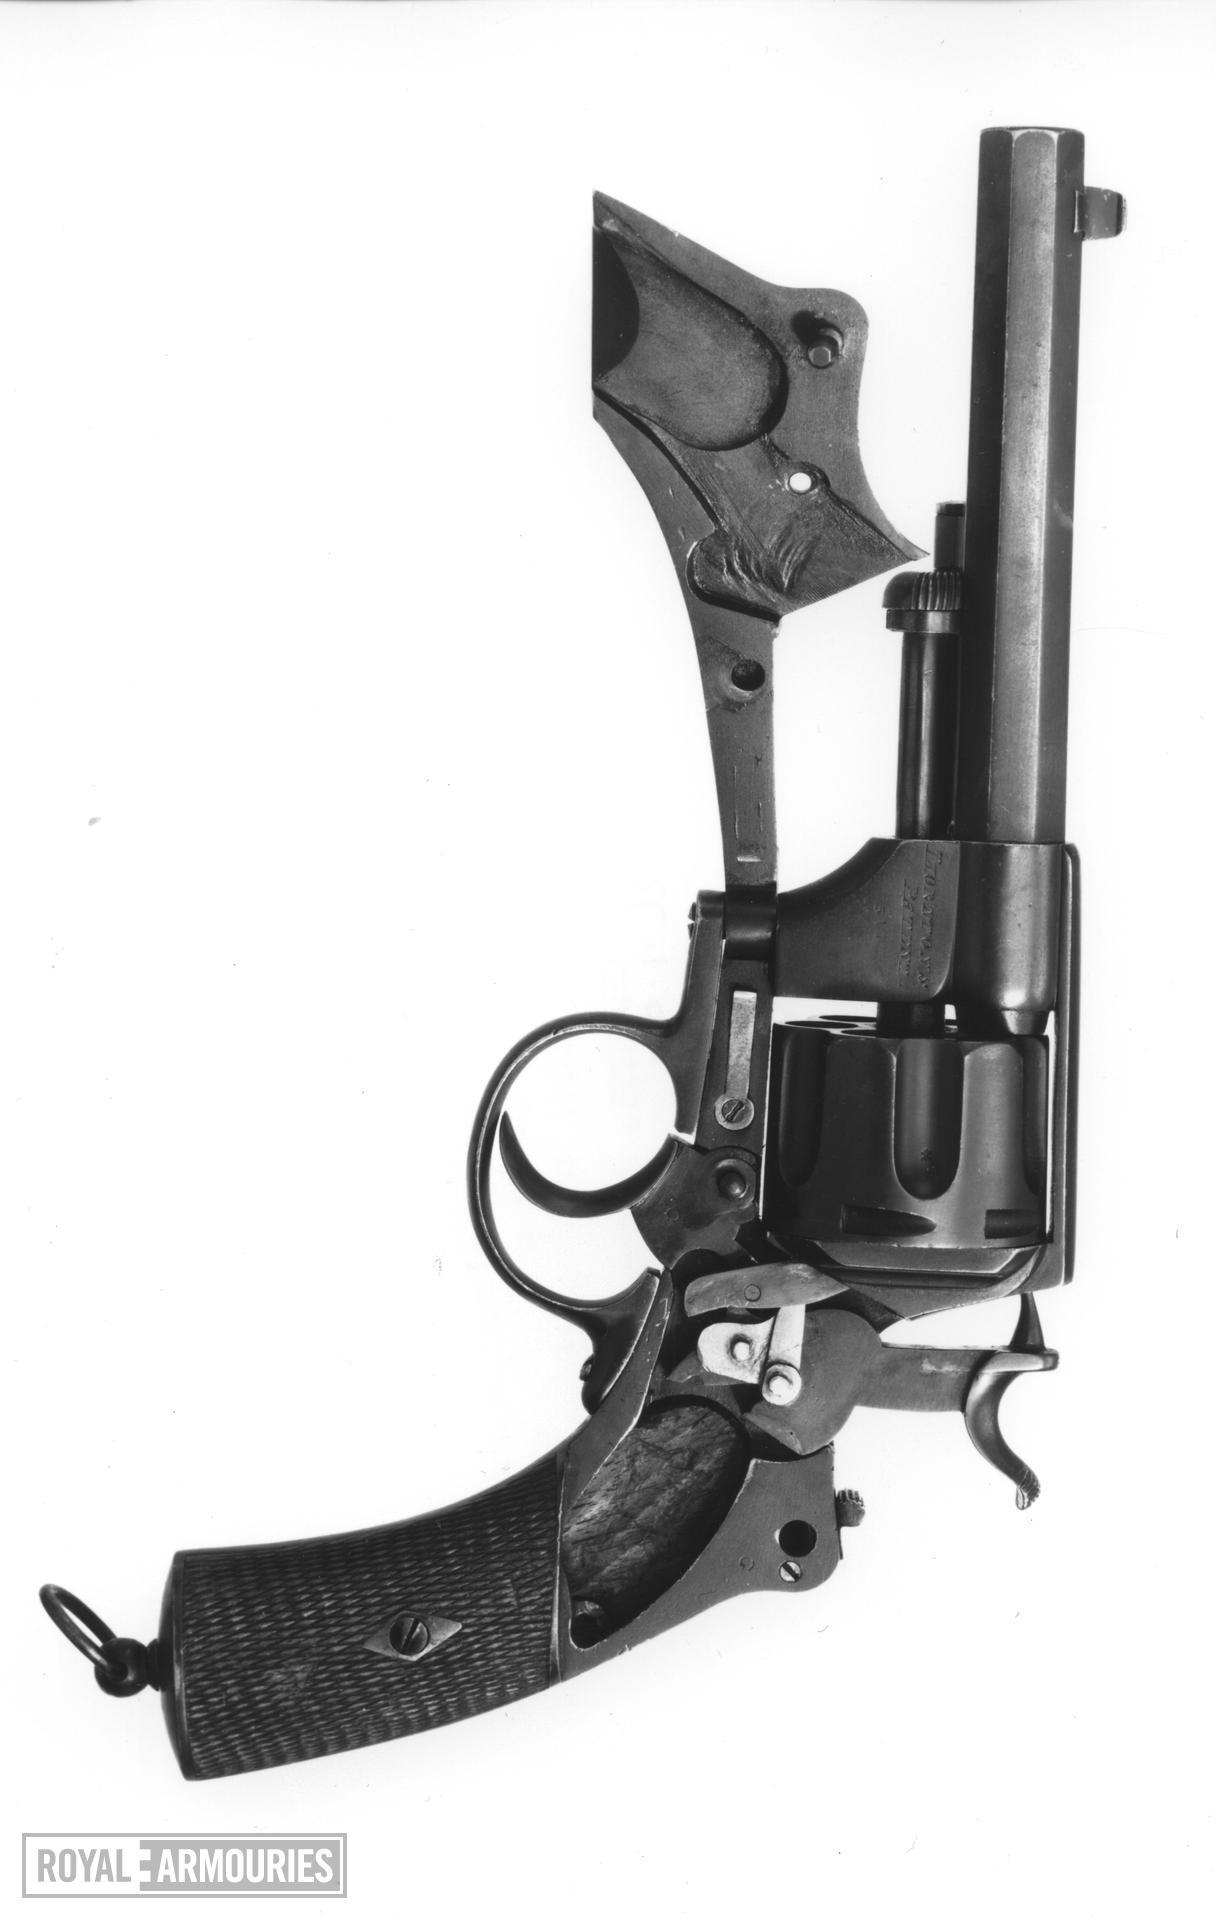 Centrefire six-shot revolver - Thornton's patent